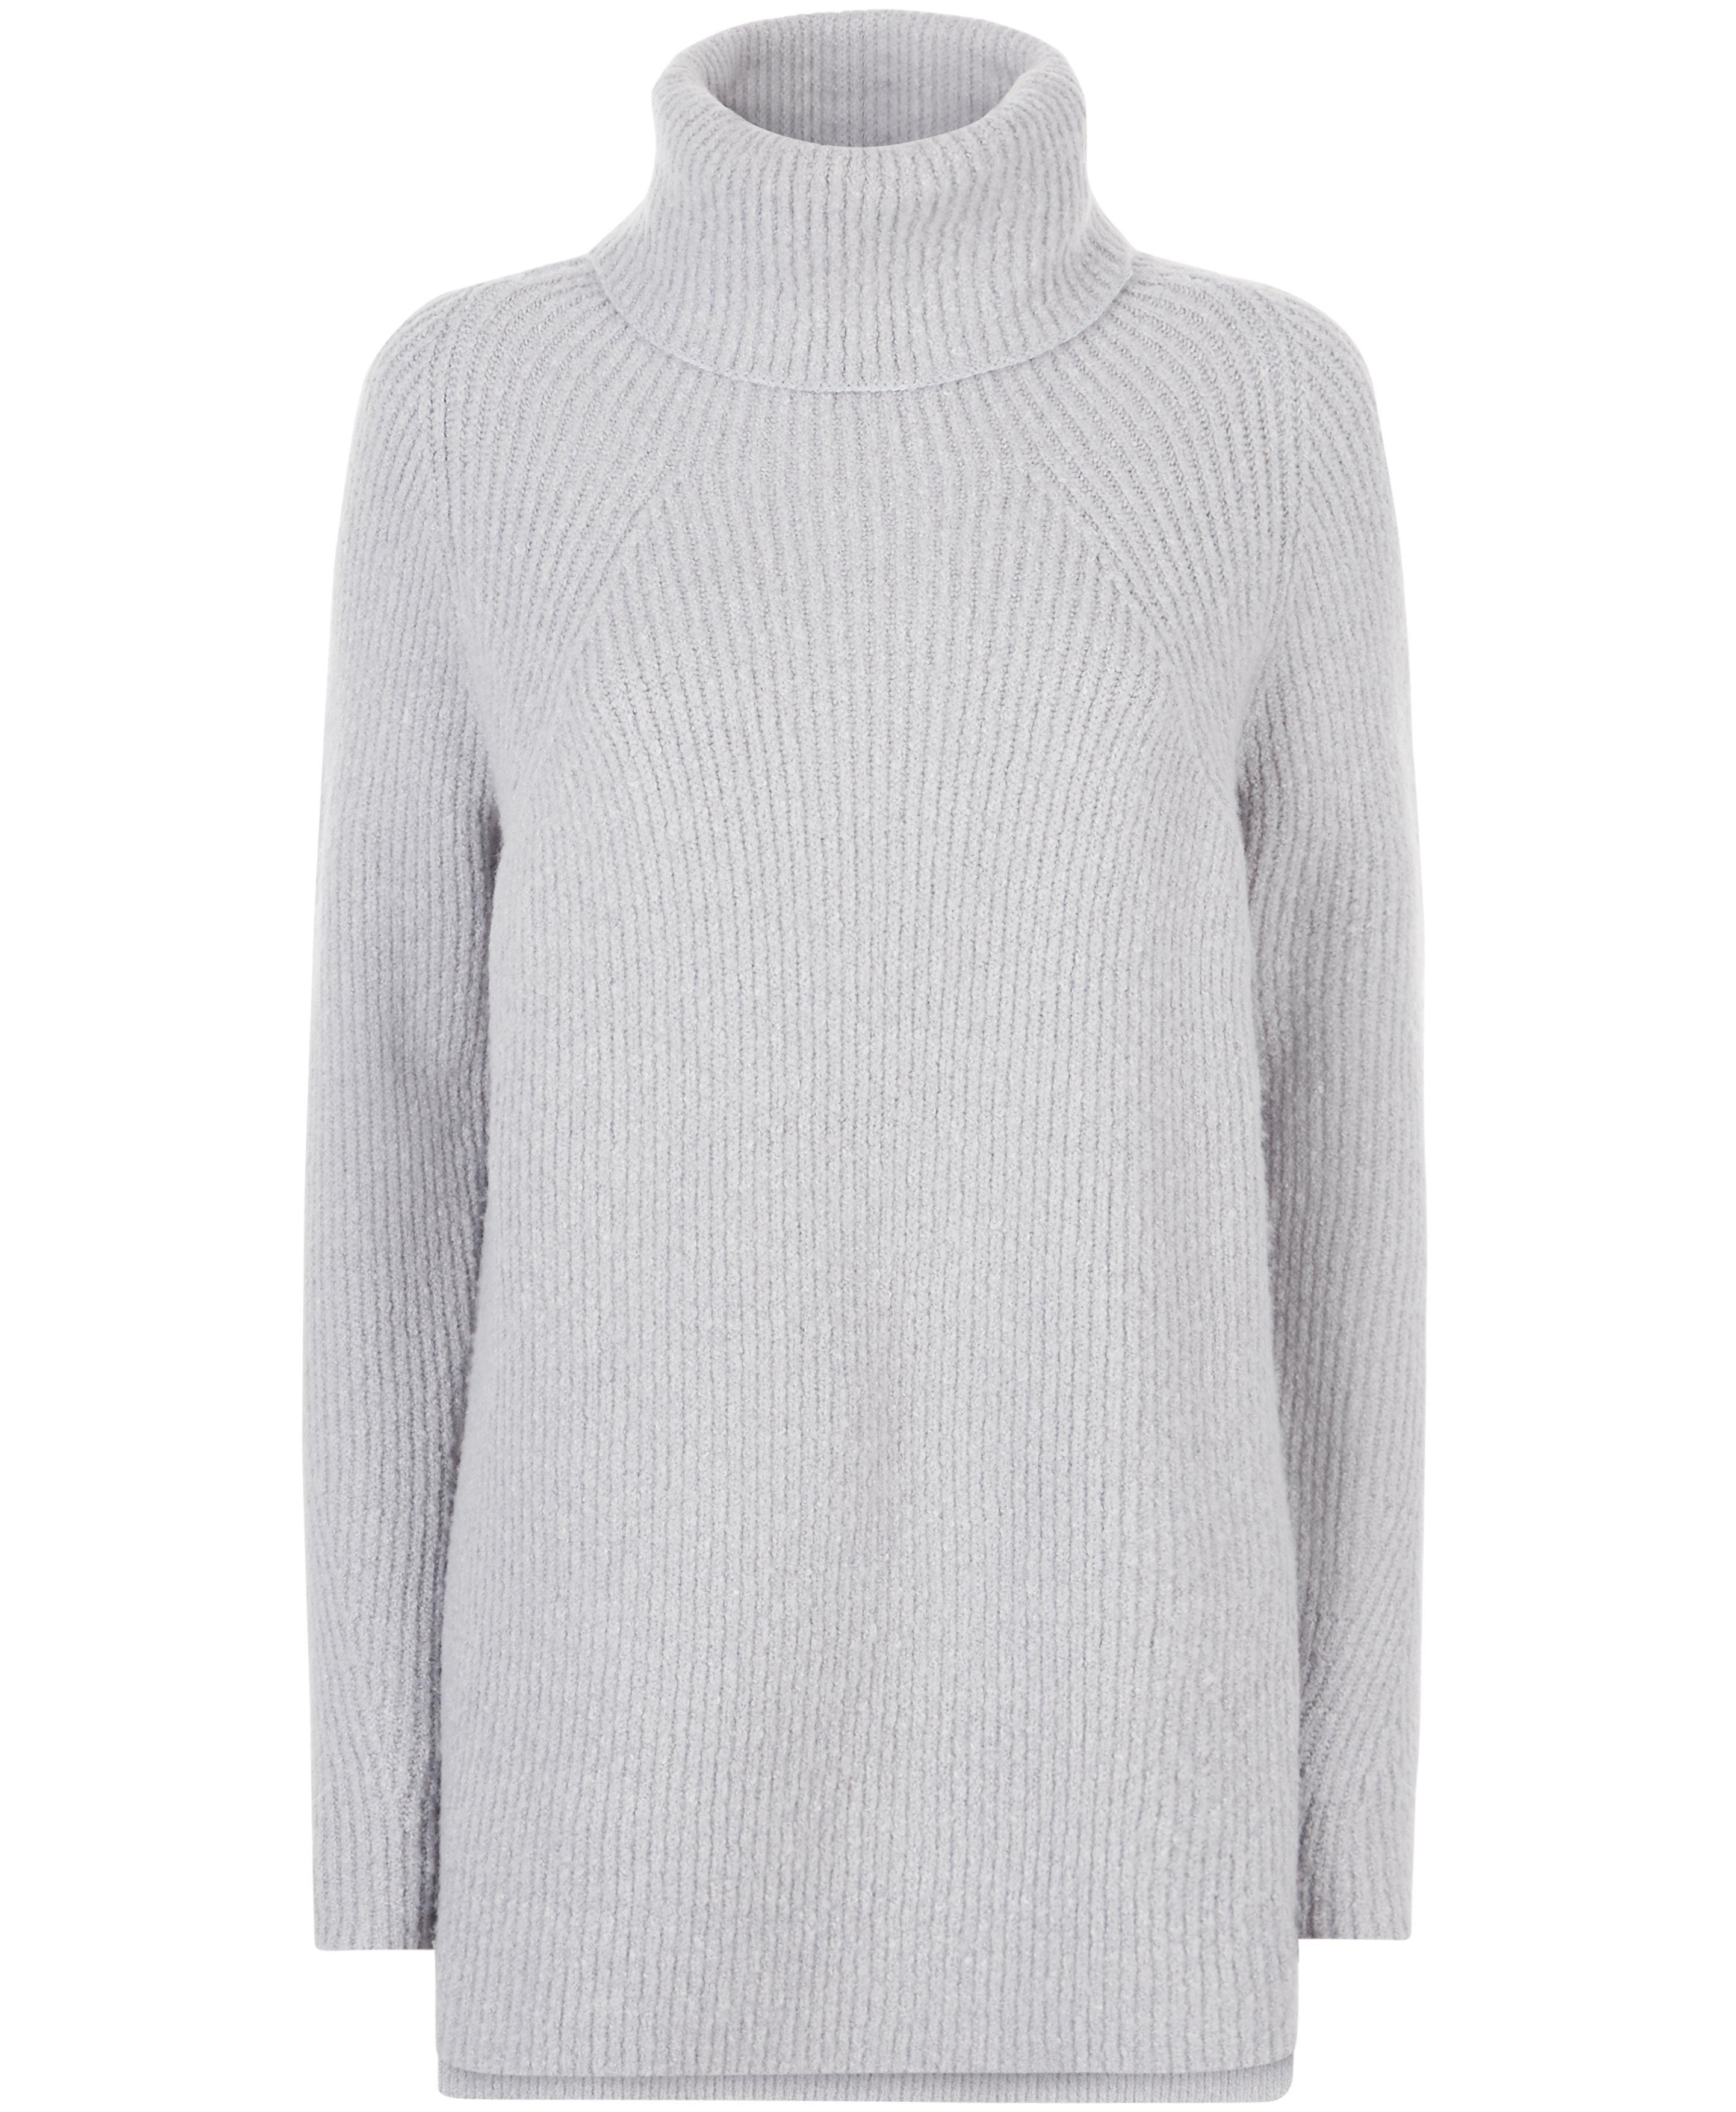 shakti knitted jumper